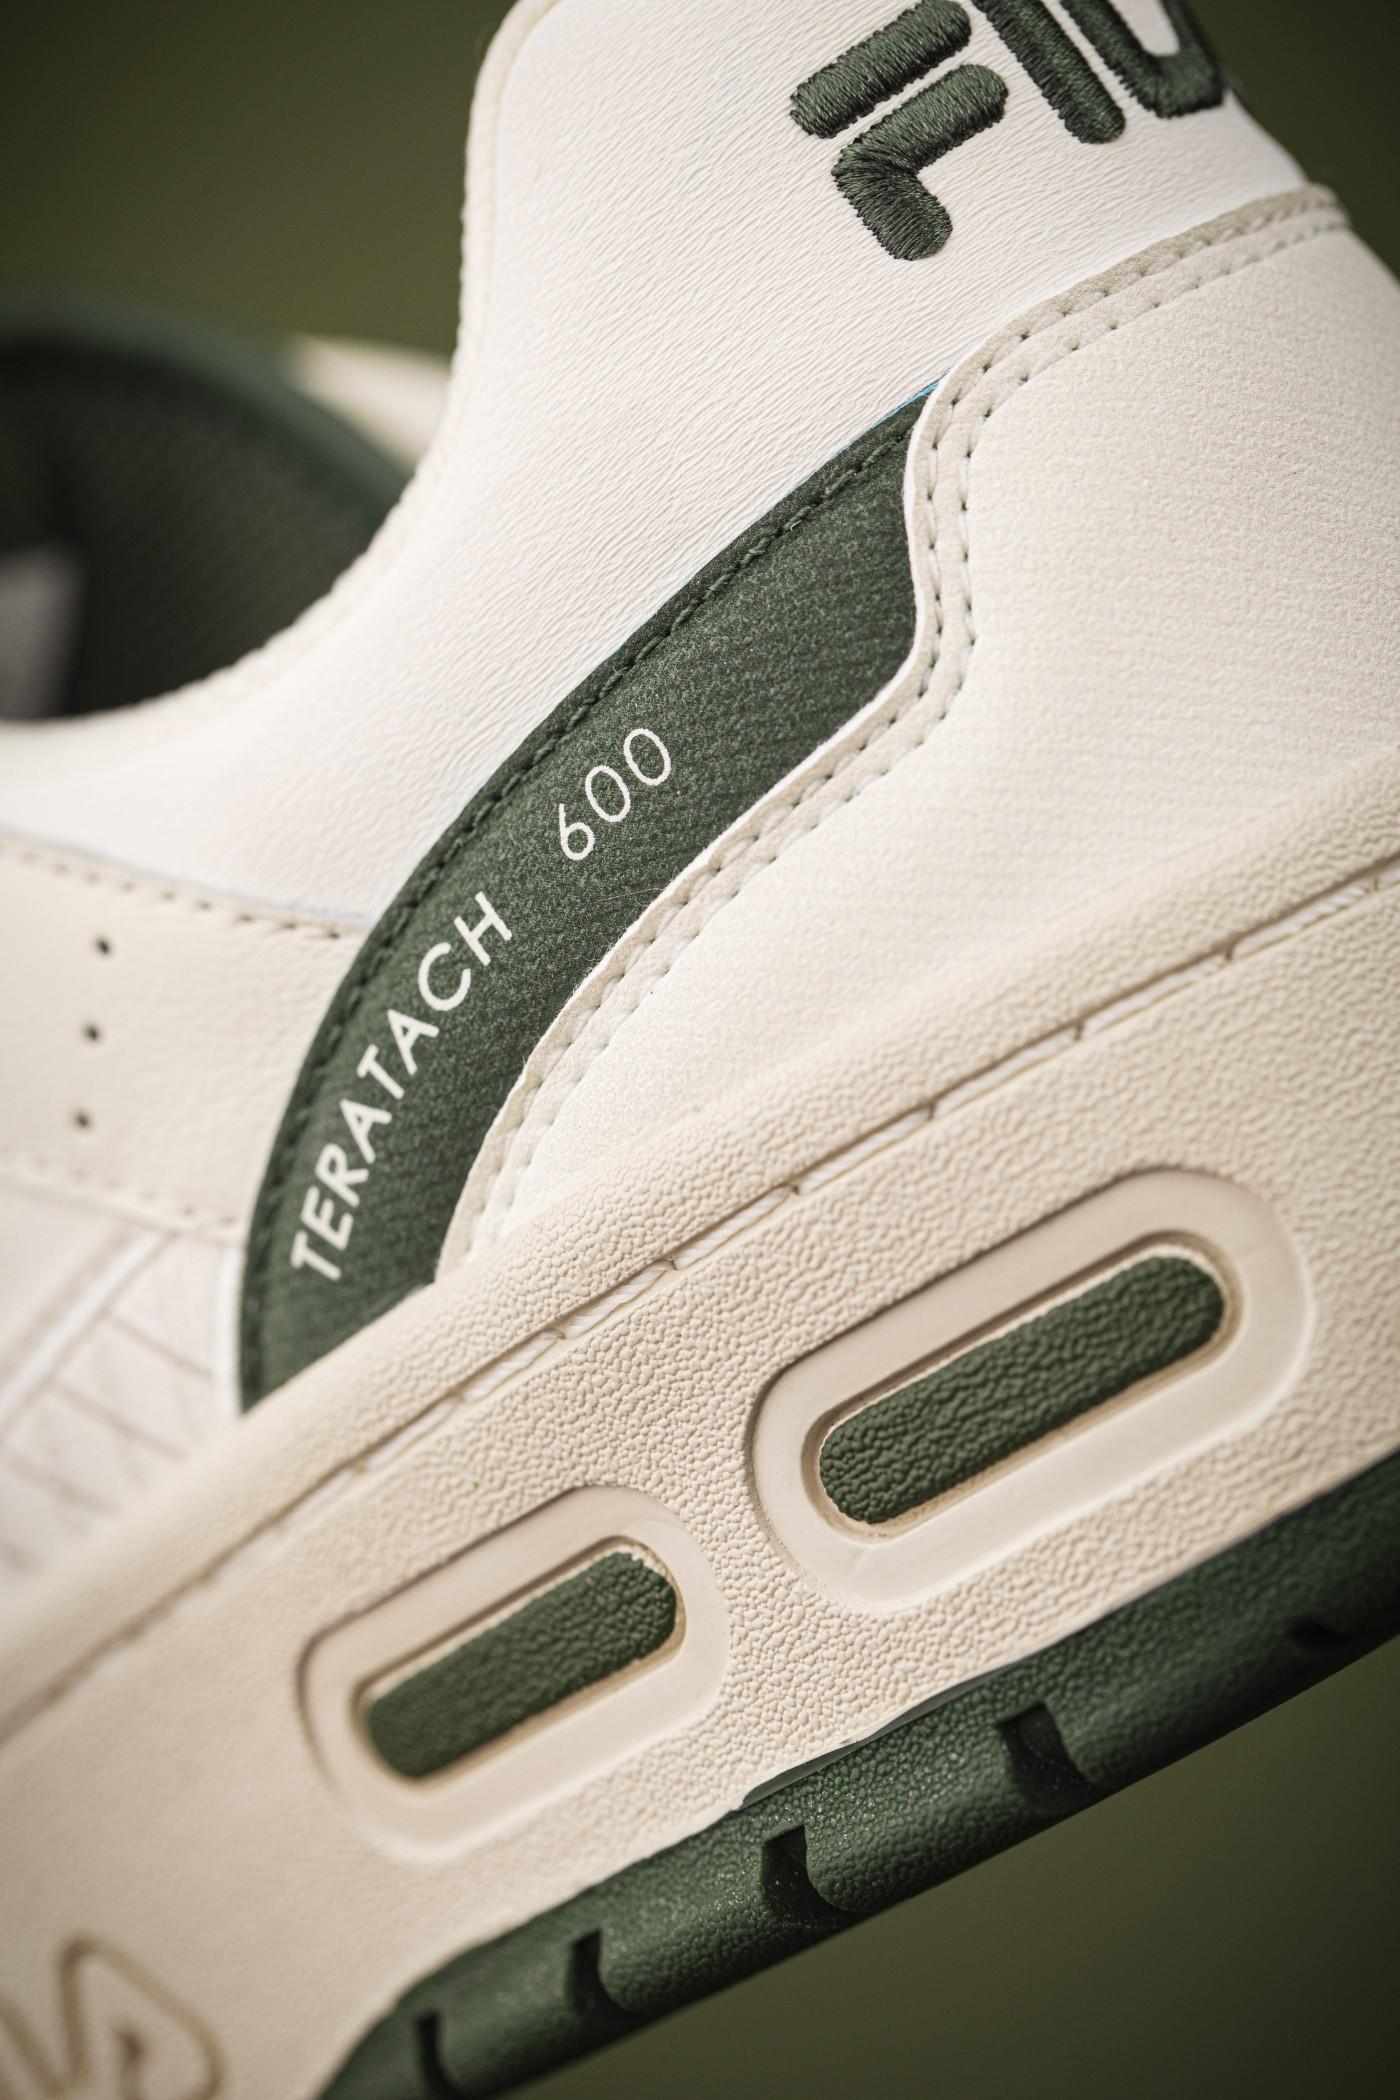 FILA FUSION,发售,TERATACH LOW  纯正 OG 质感!又一双经典球鞋复刻回归!脚感还更爽了!